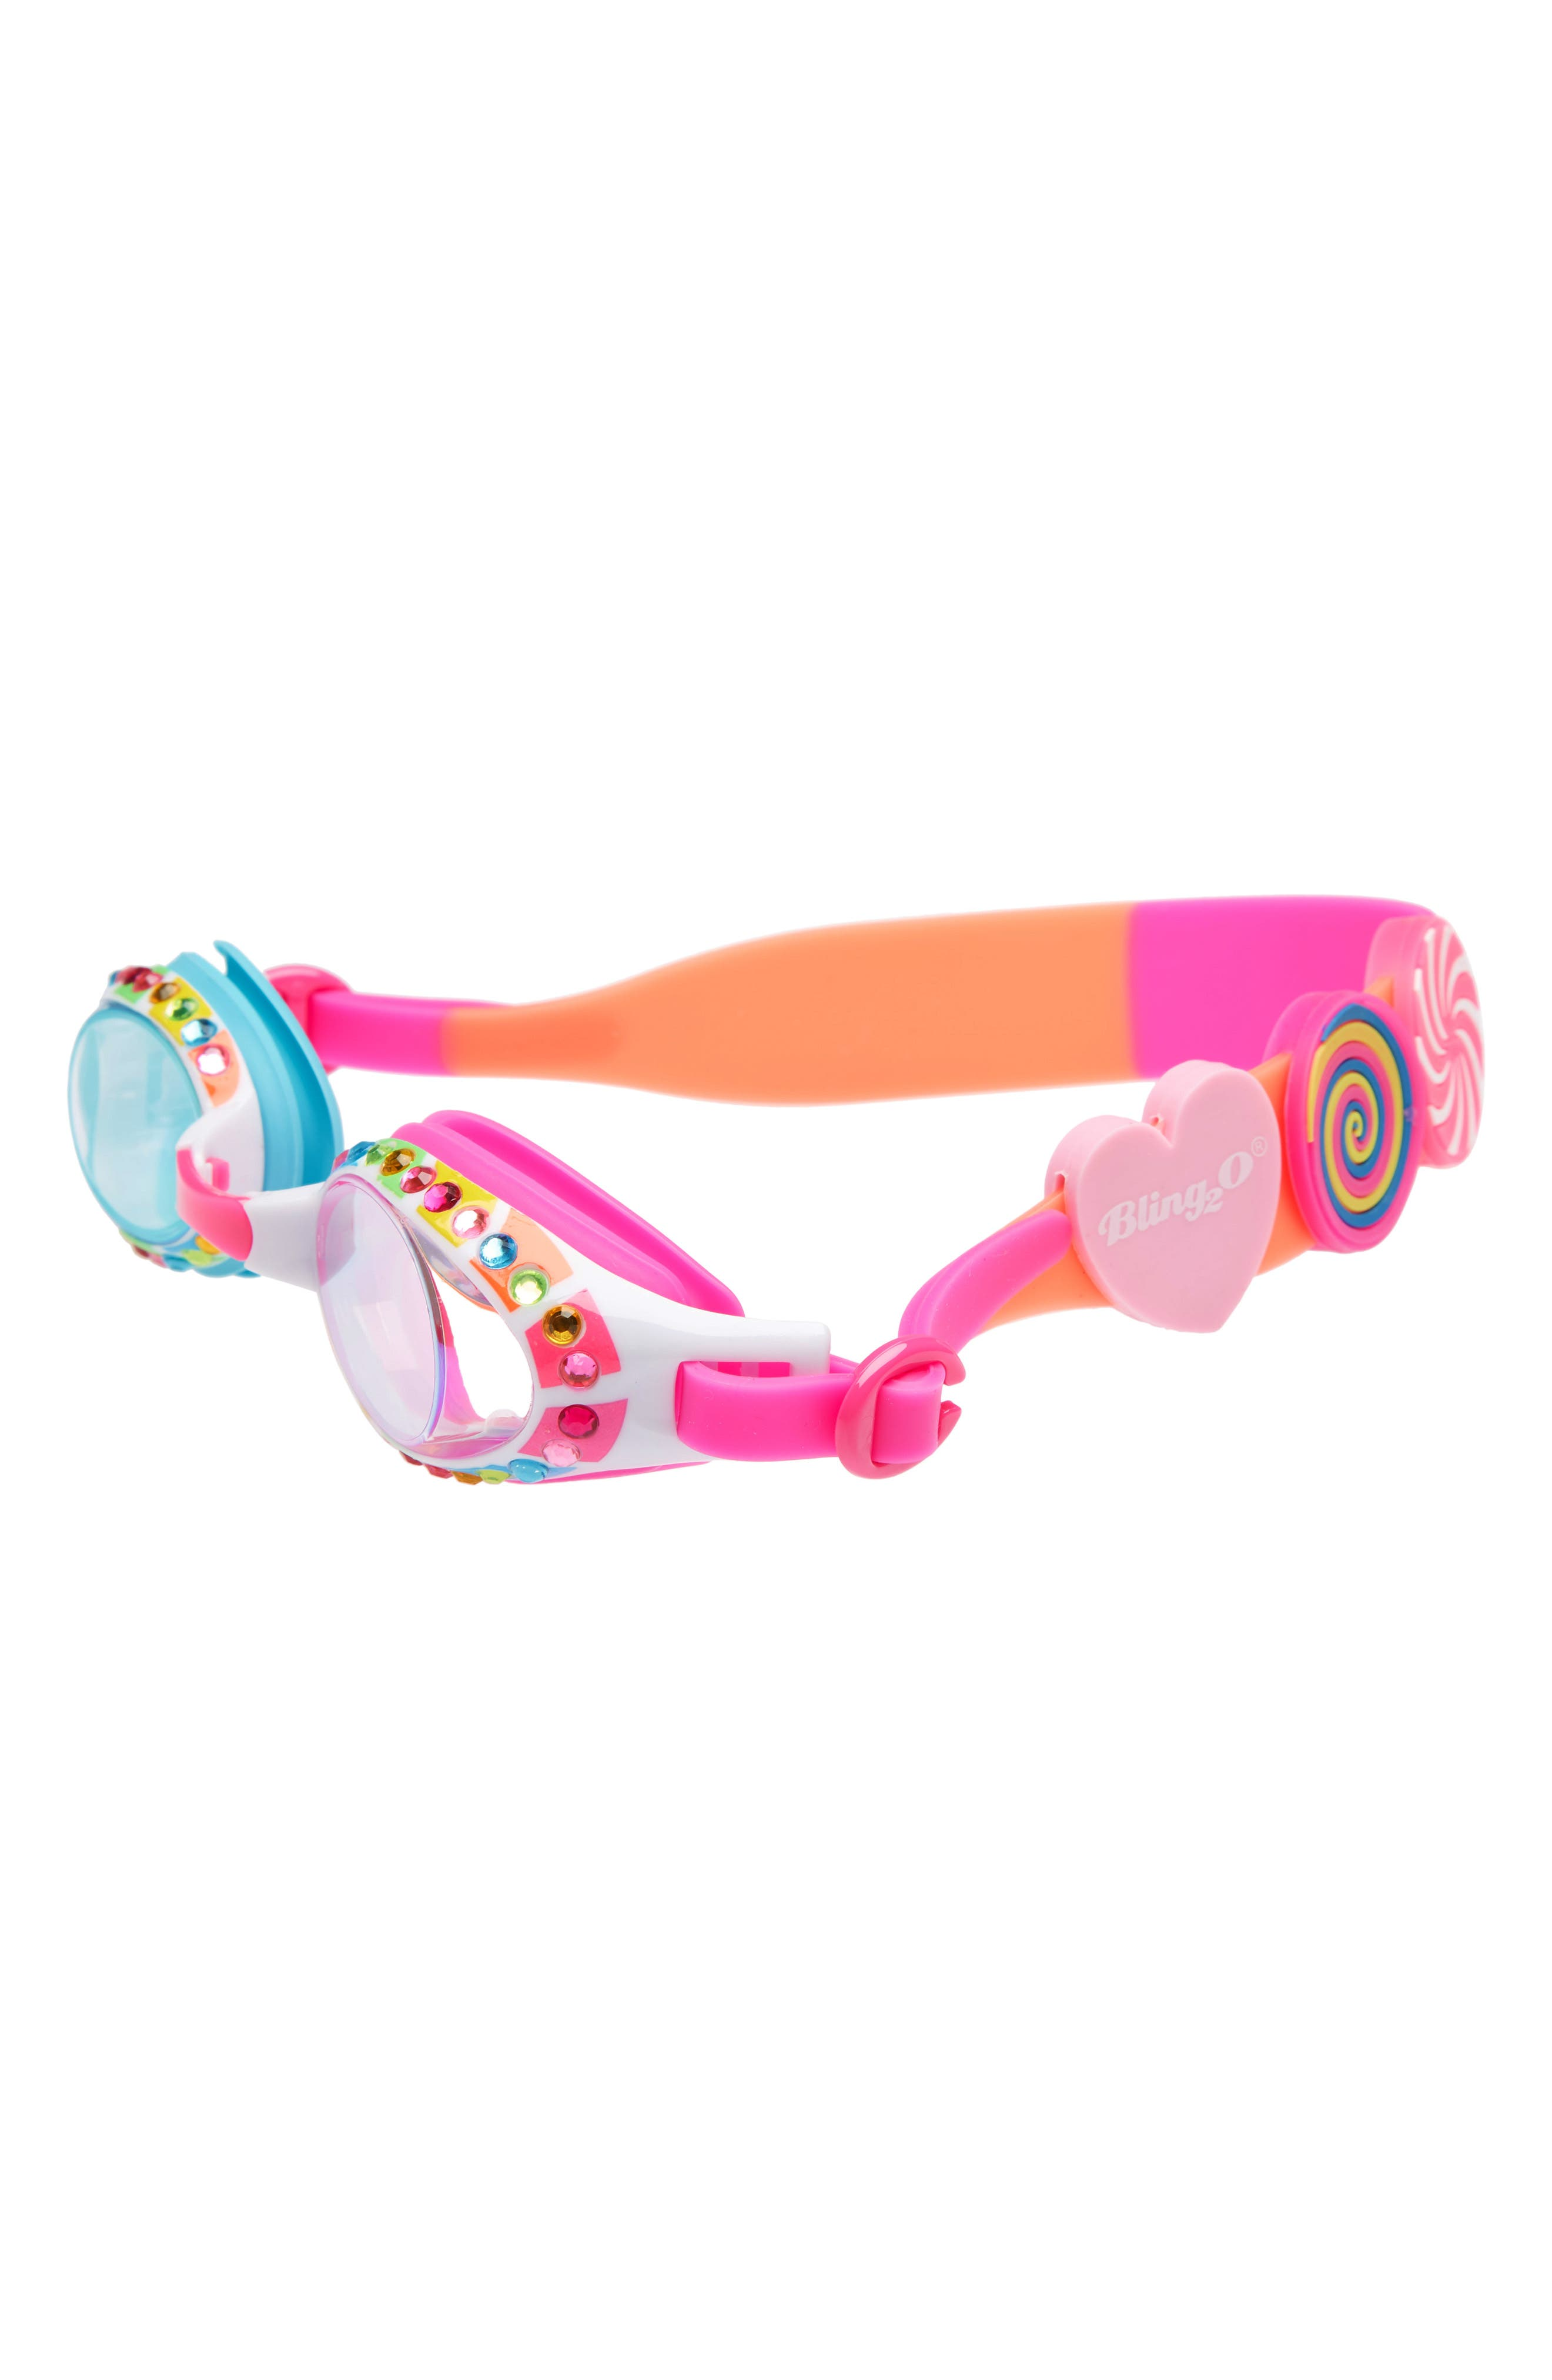 Bling2o Lolli Poppins Swim Goggles (Girls)